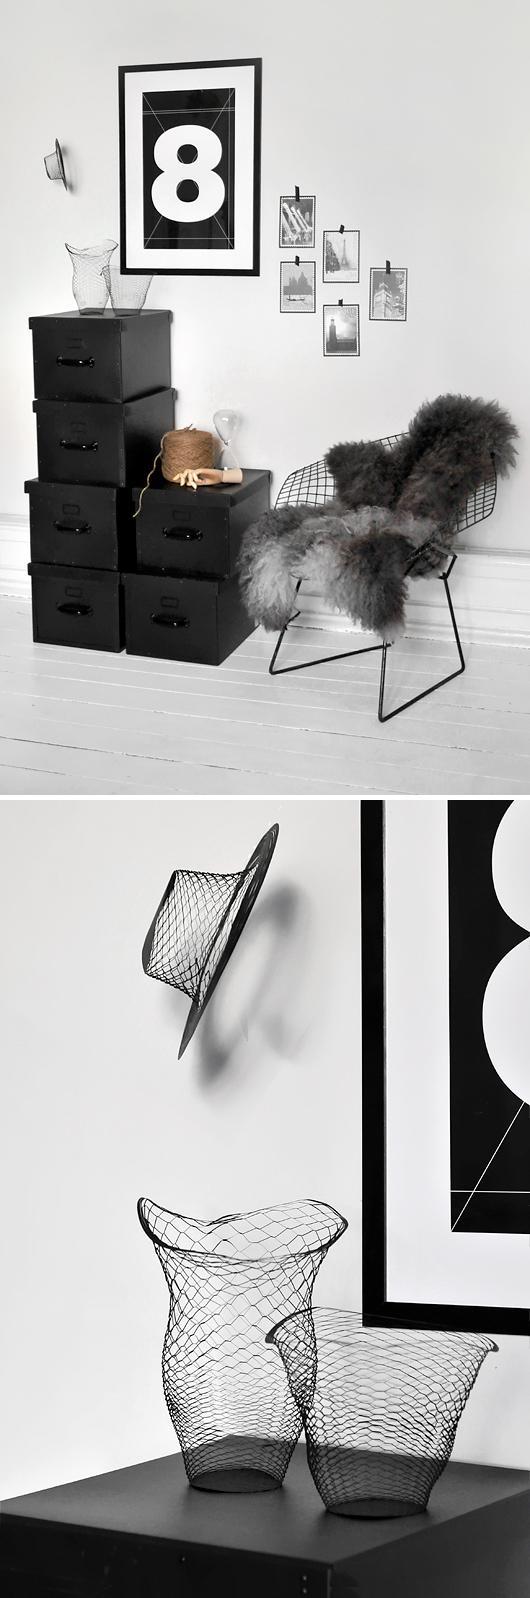 Trendenser - Diamond chair och Air Vase